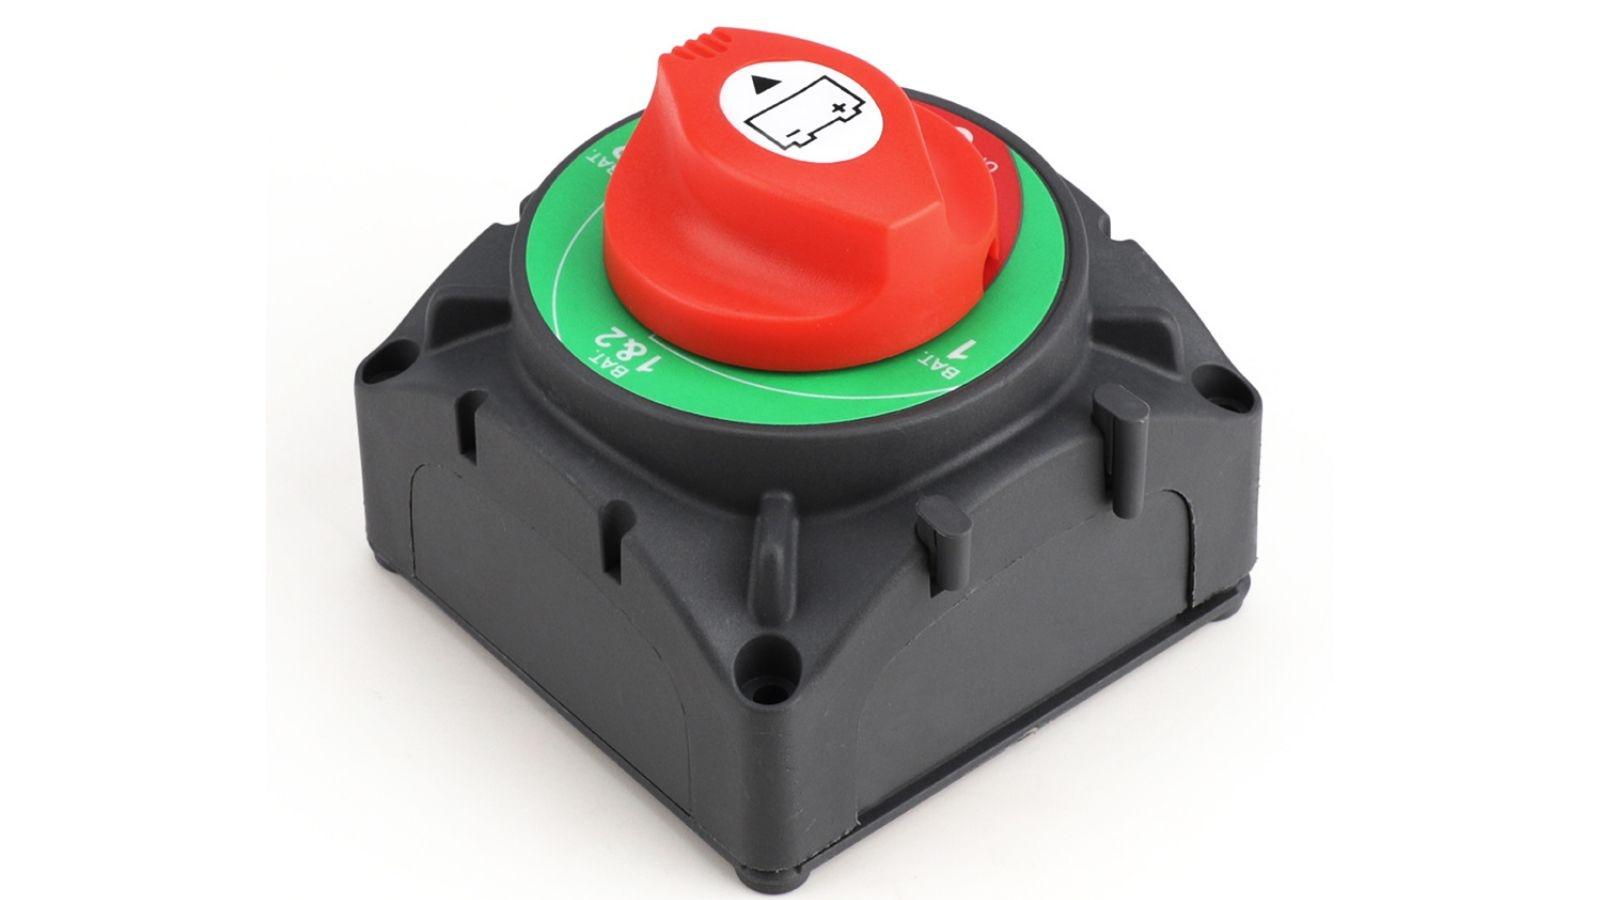 Heavy Duty Dual Bateria Disconnect Interruptor Seletor 1-2-Tanto-Off Interruptor Da Bateria